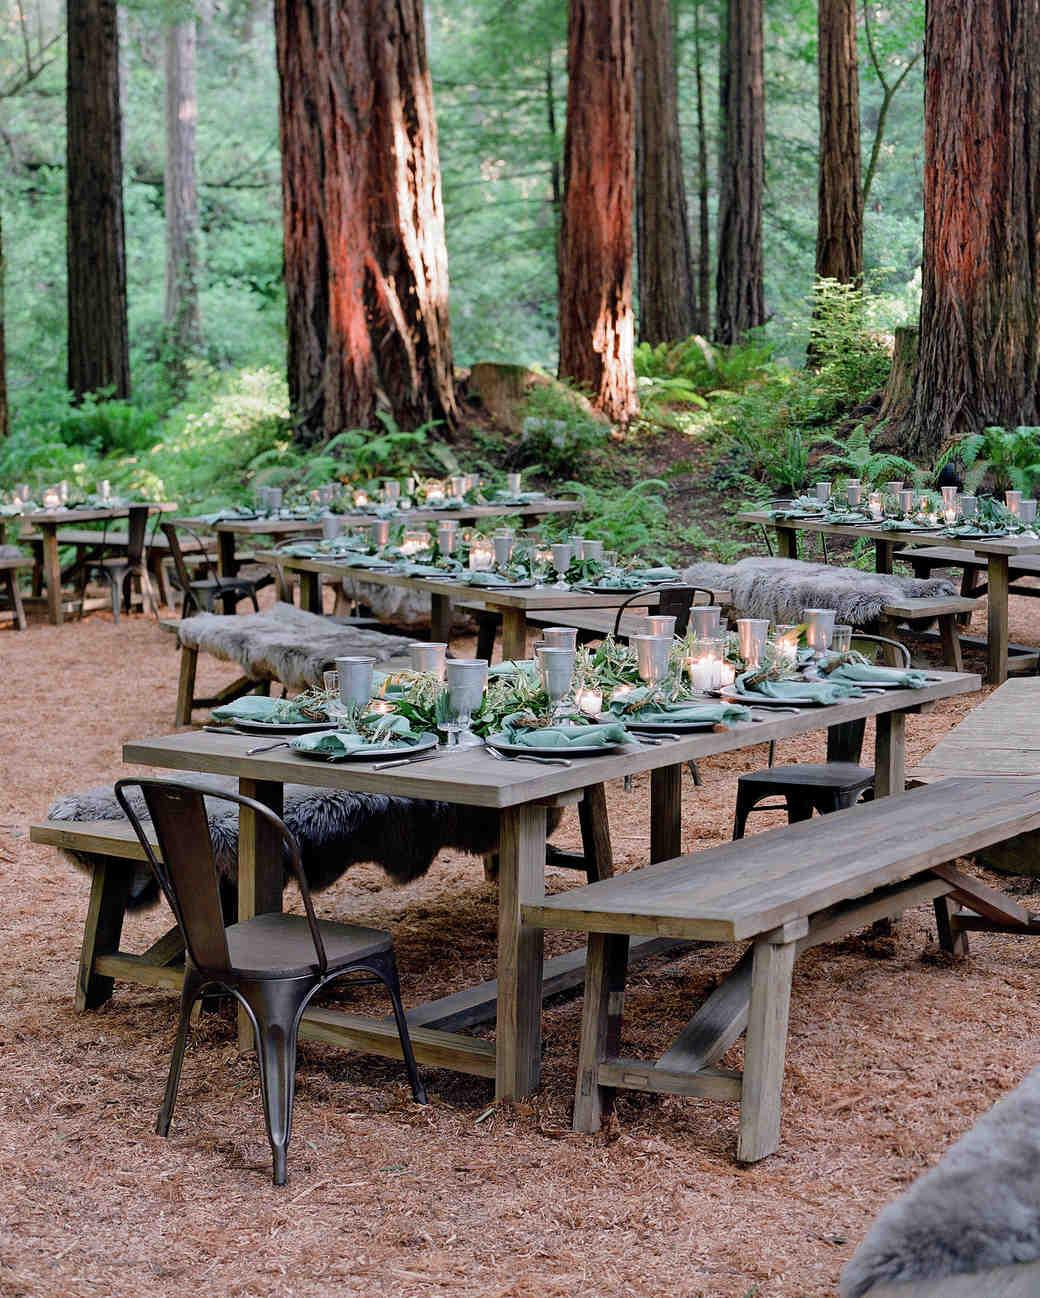 whitney zach rehearsal dinner long tables woods